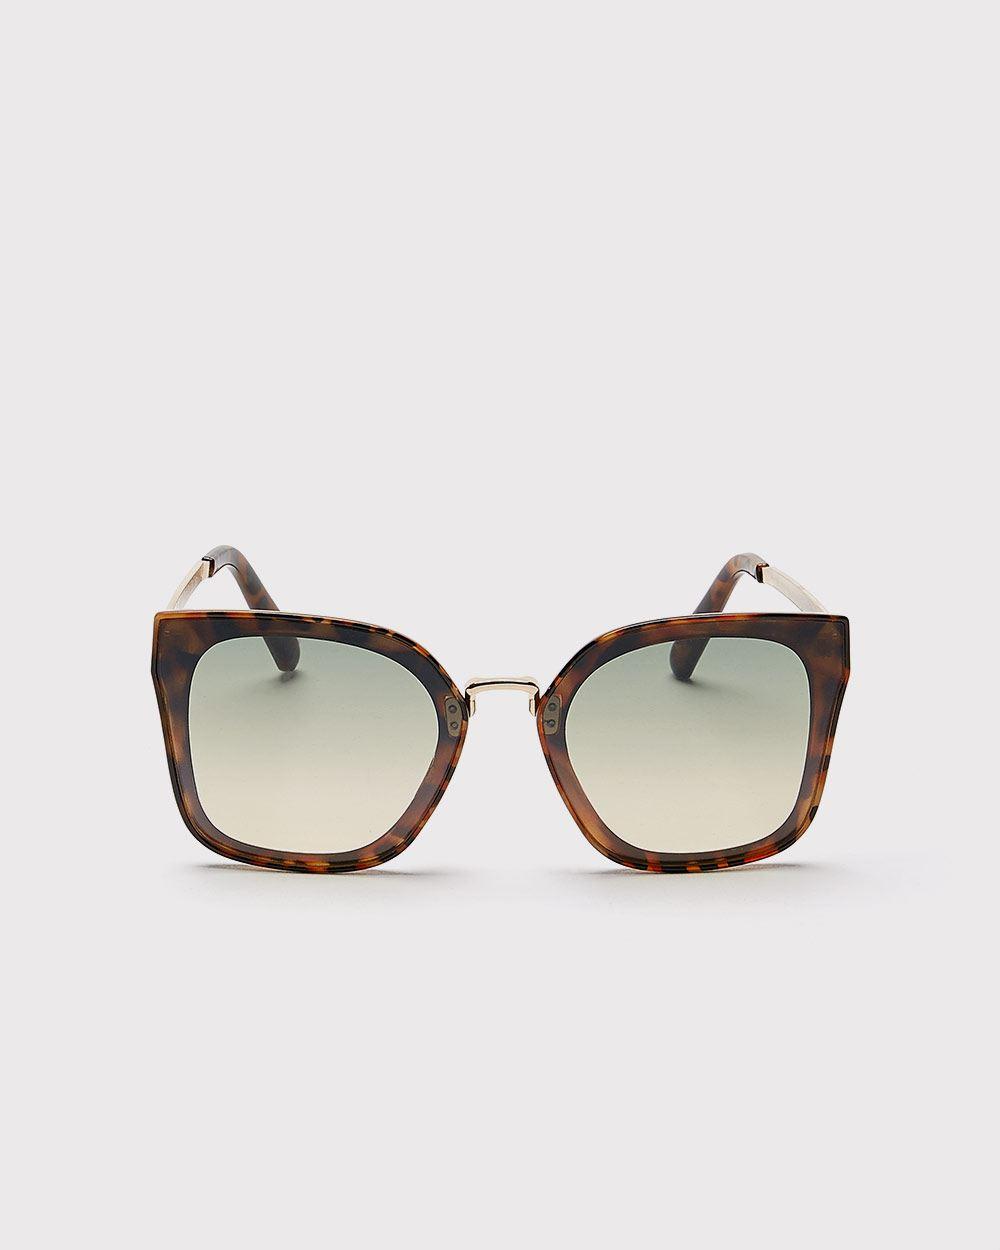 33cb4e6e4e Large Square frame Sunglasses